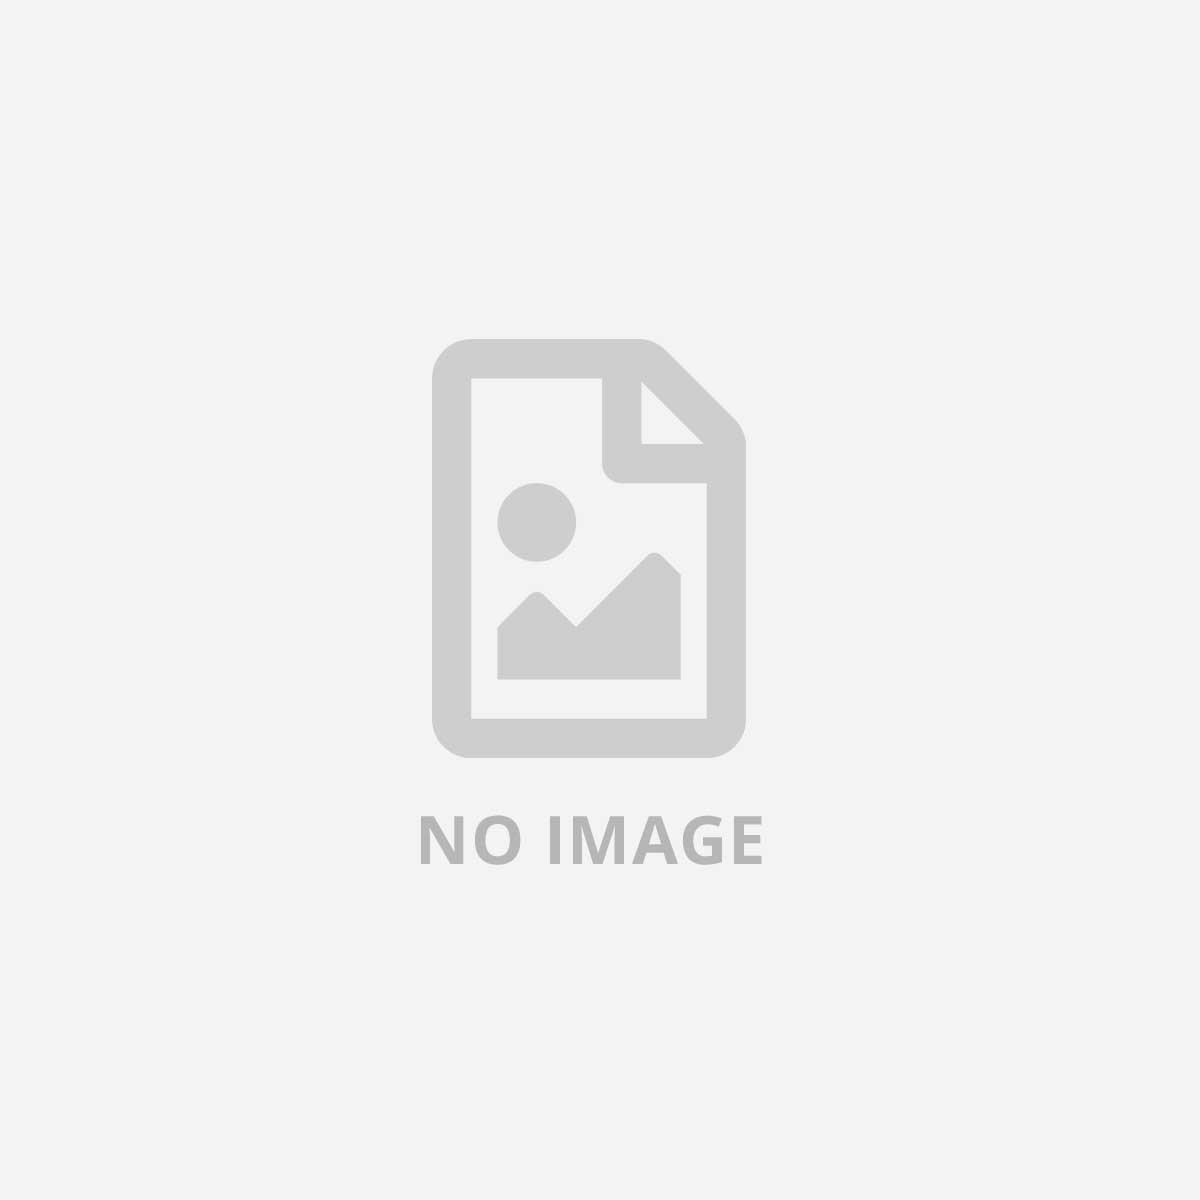 KINGSTON 16GB MICSD CANVASSELECT PLUS